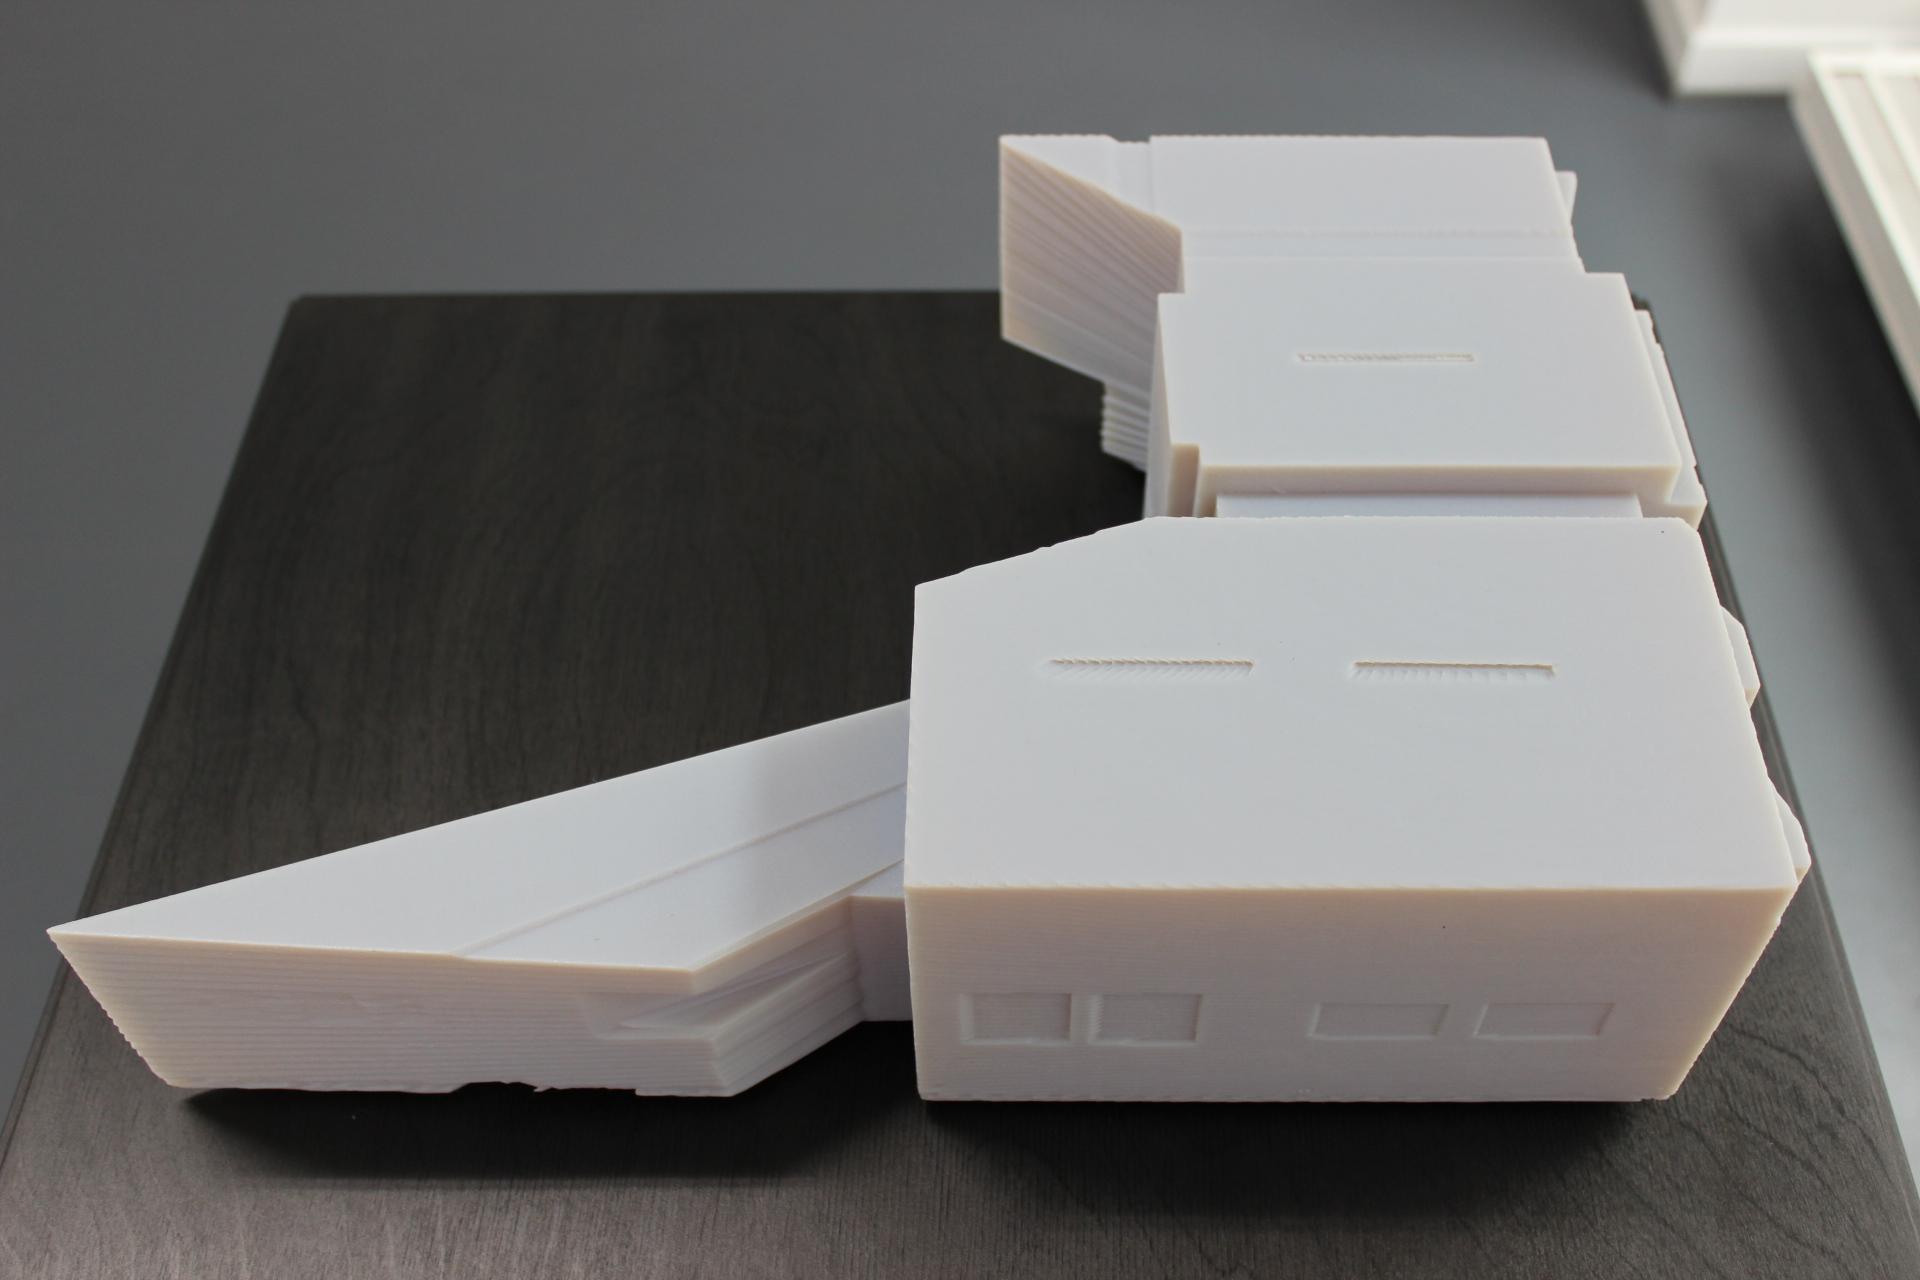 Driessens & Verstappen, 3-D Print, etwa 35 x 25 x 15 cm, 2013